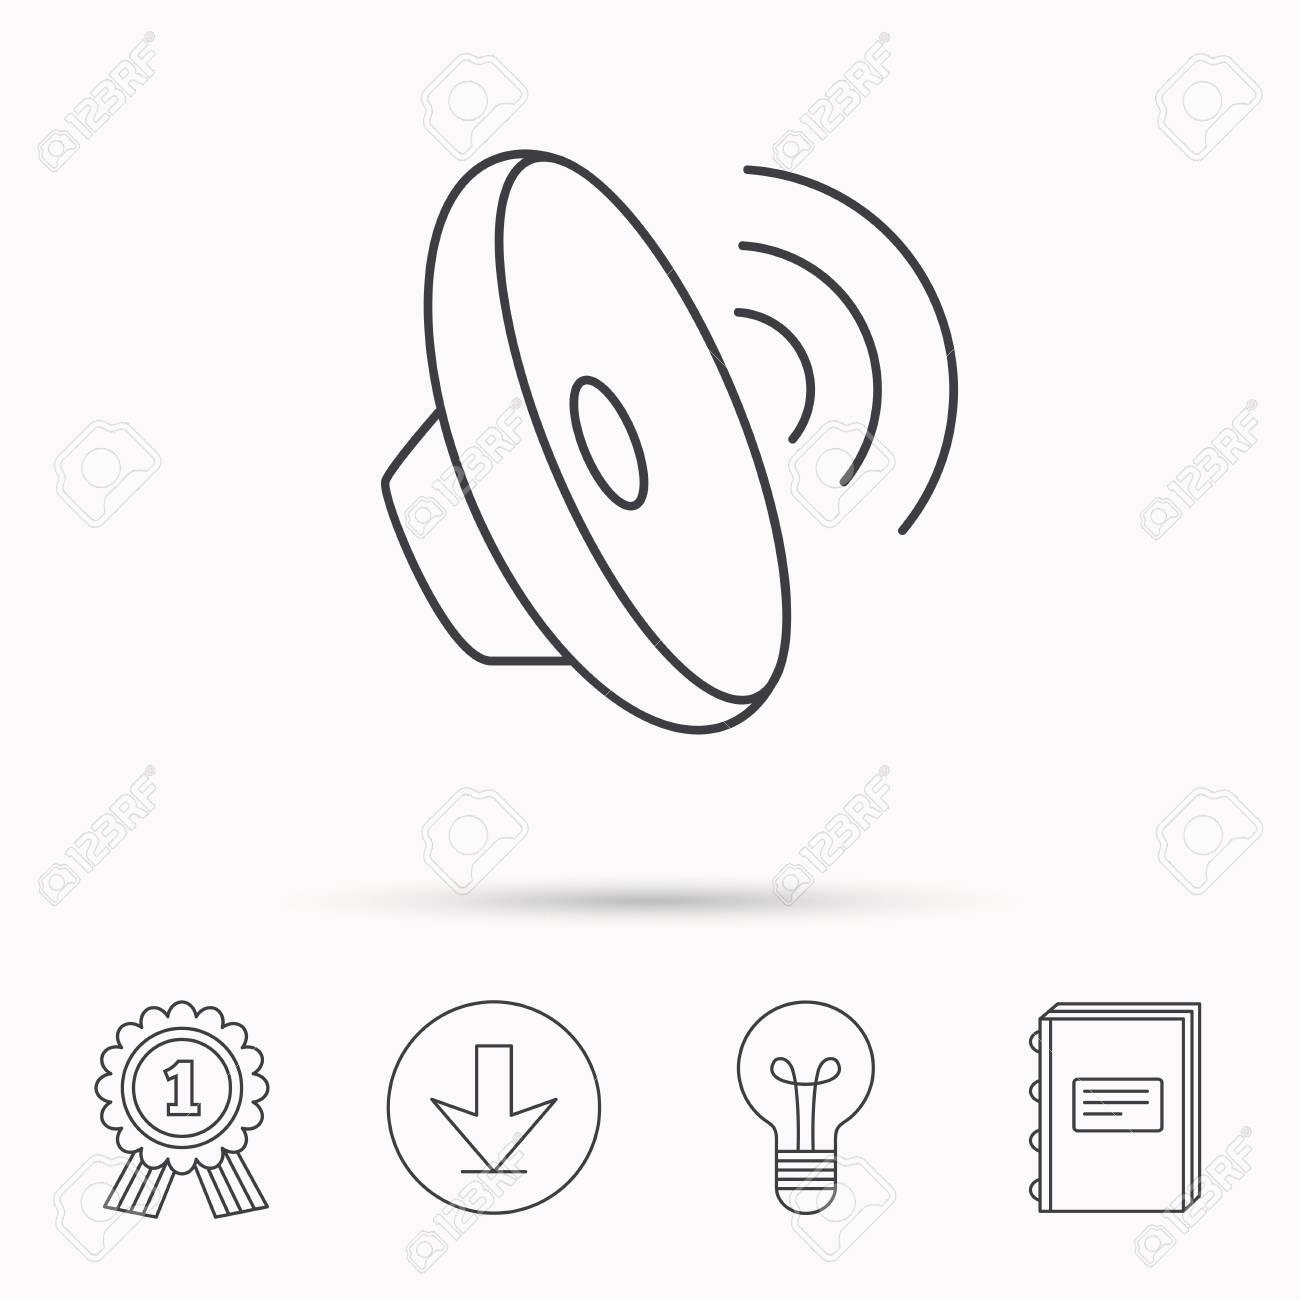 Sound waves icon  Audio speaker sign  Music symbol  Download